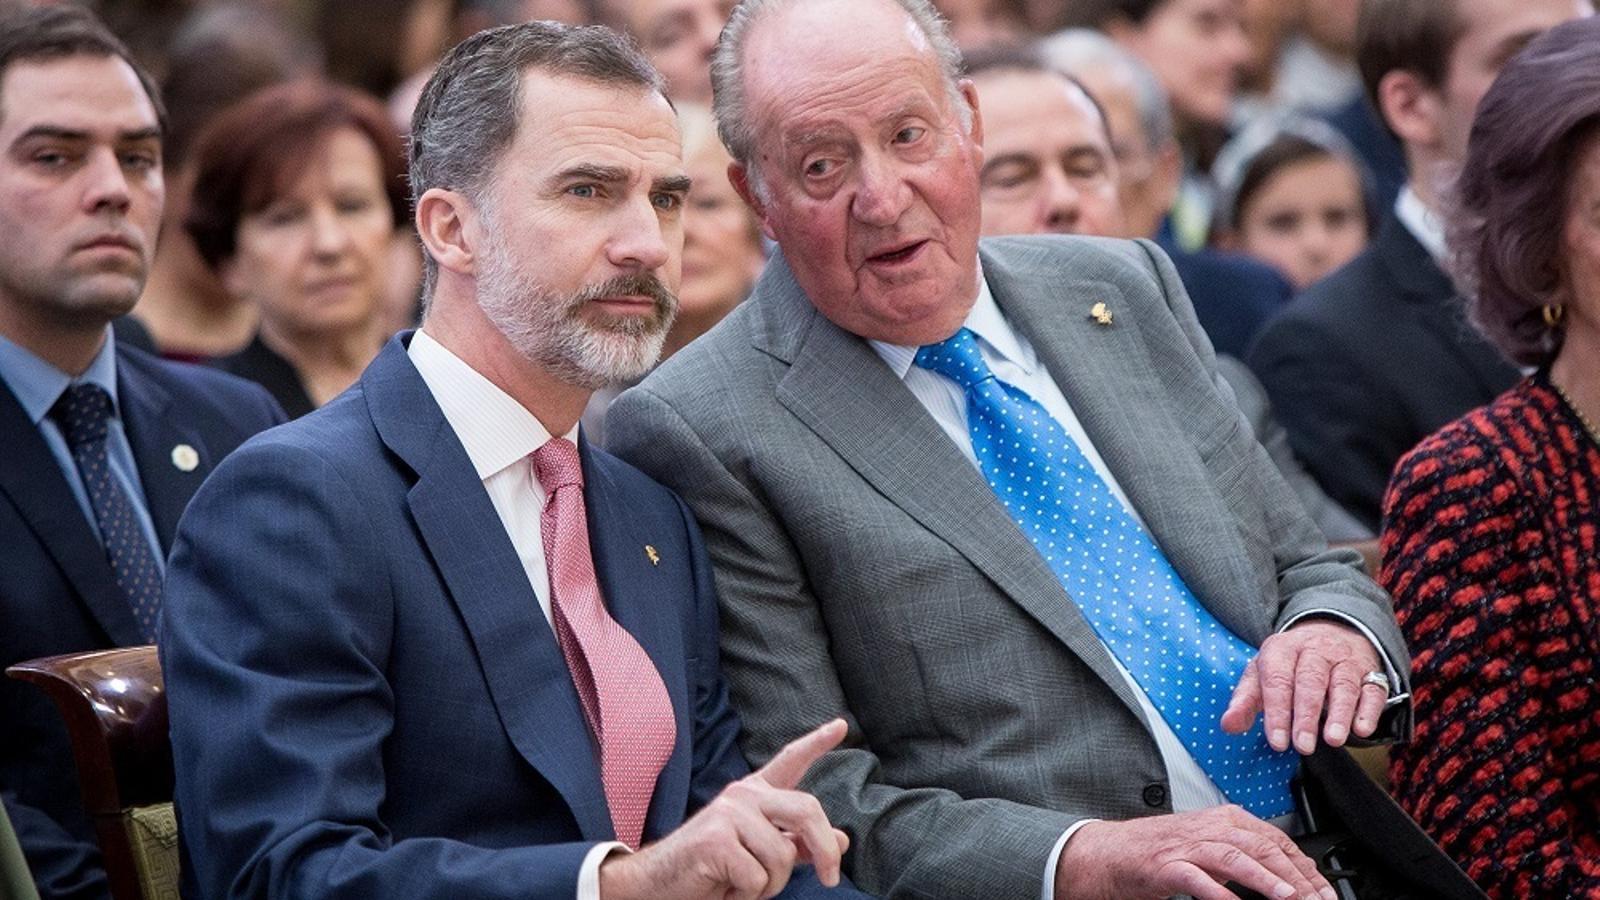 Felip VI i el rei emèrit, Joan Carles VI